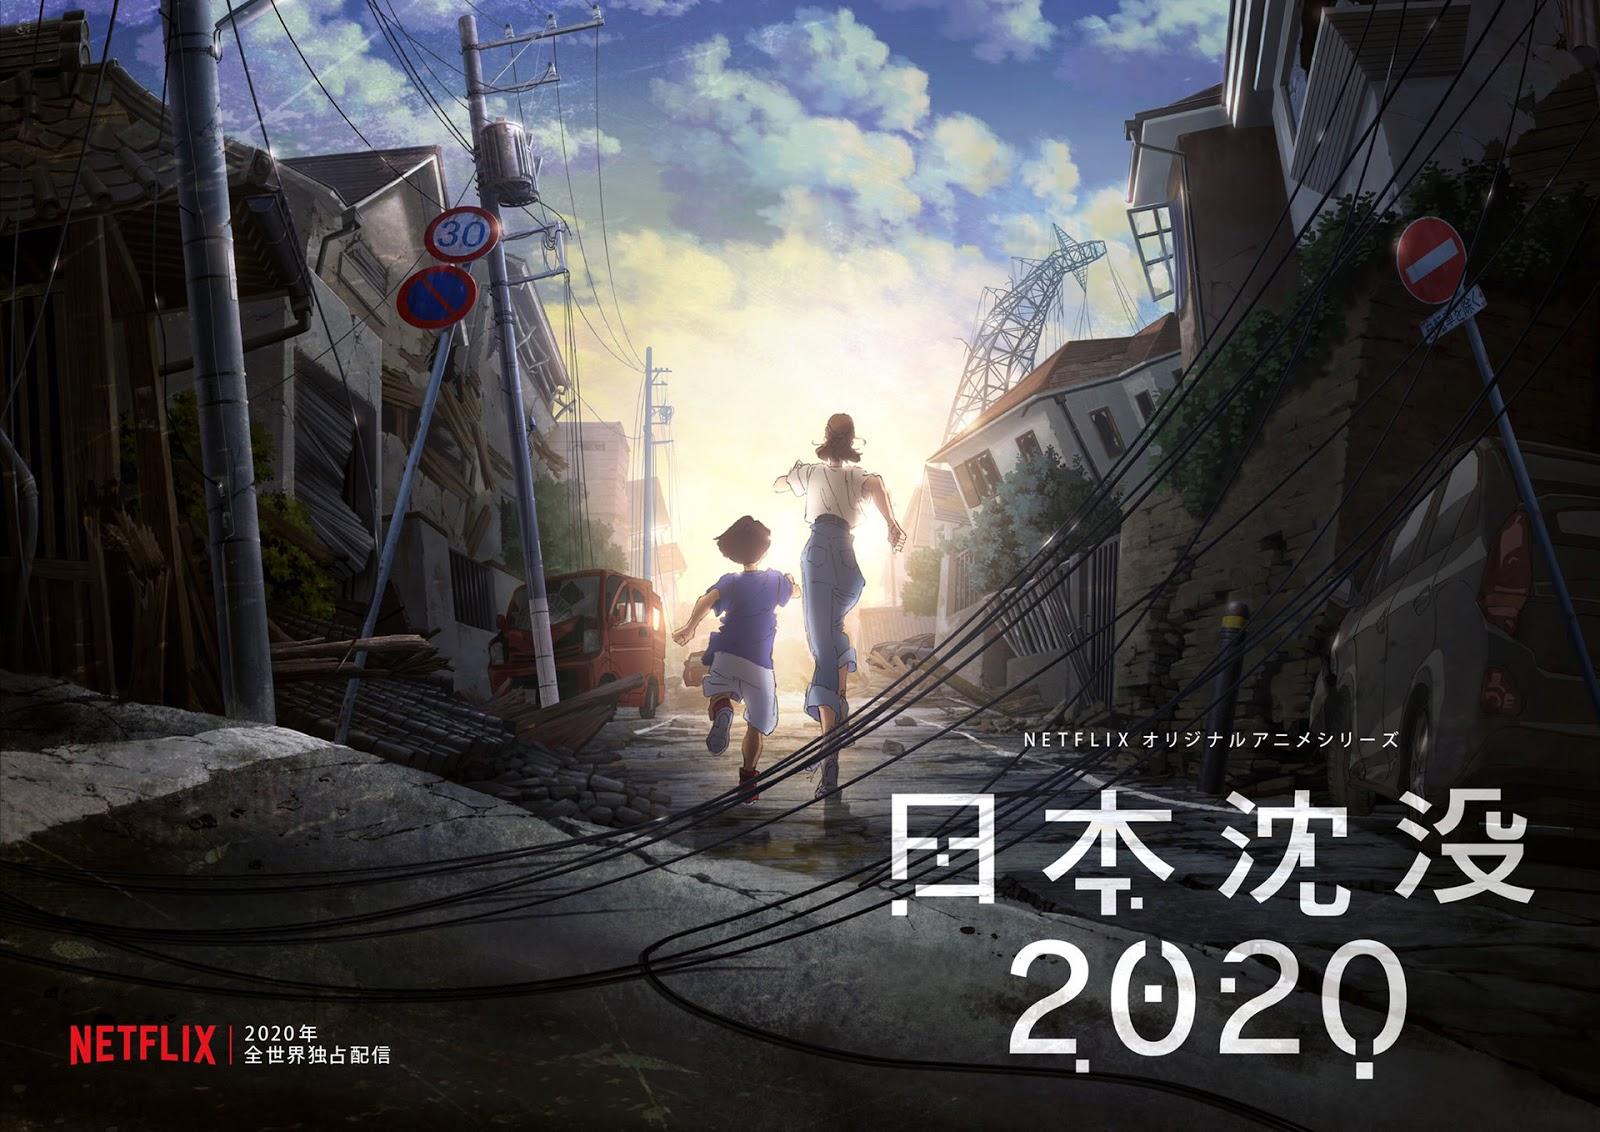 Japan Sinks: 2020 Season 1 NETFLIX 1080p [Multi-Subs]